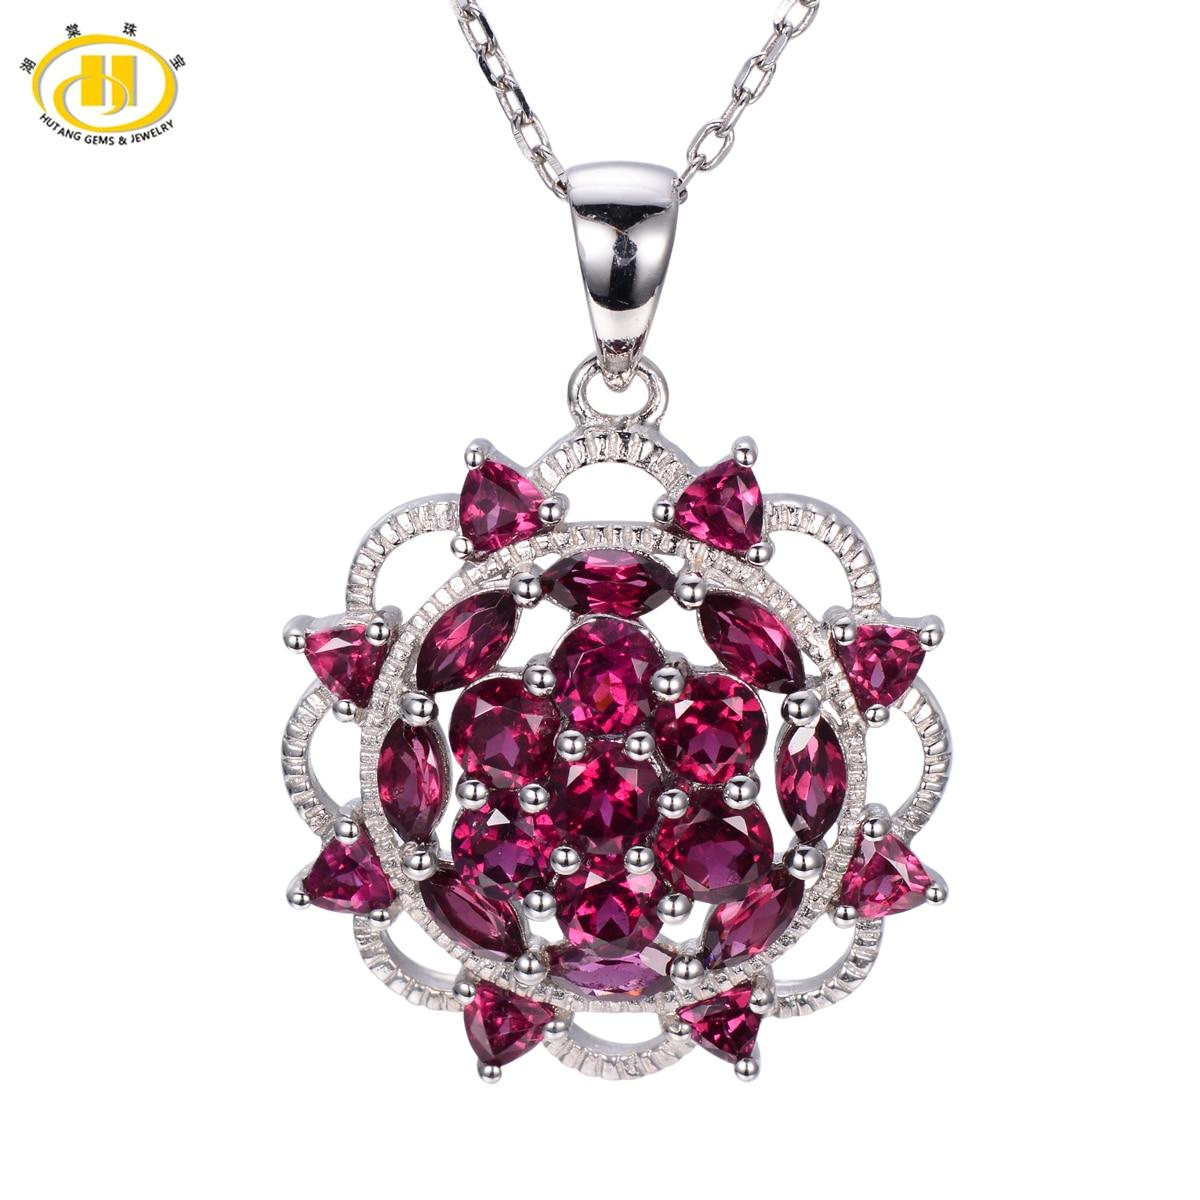 Hutang New Arrival Rhodolite Garnet Pendant Solid 925 Sterling Silver Necklace Women's Fine Jewelry Gemstone Gift